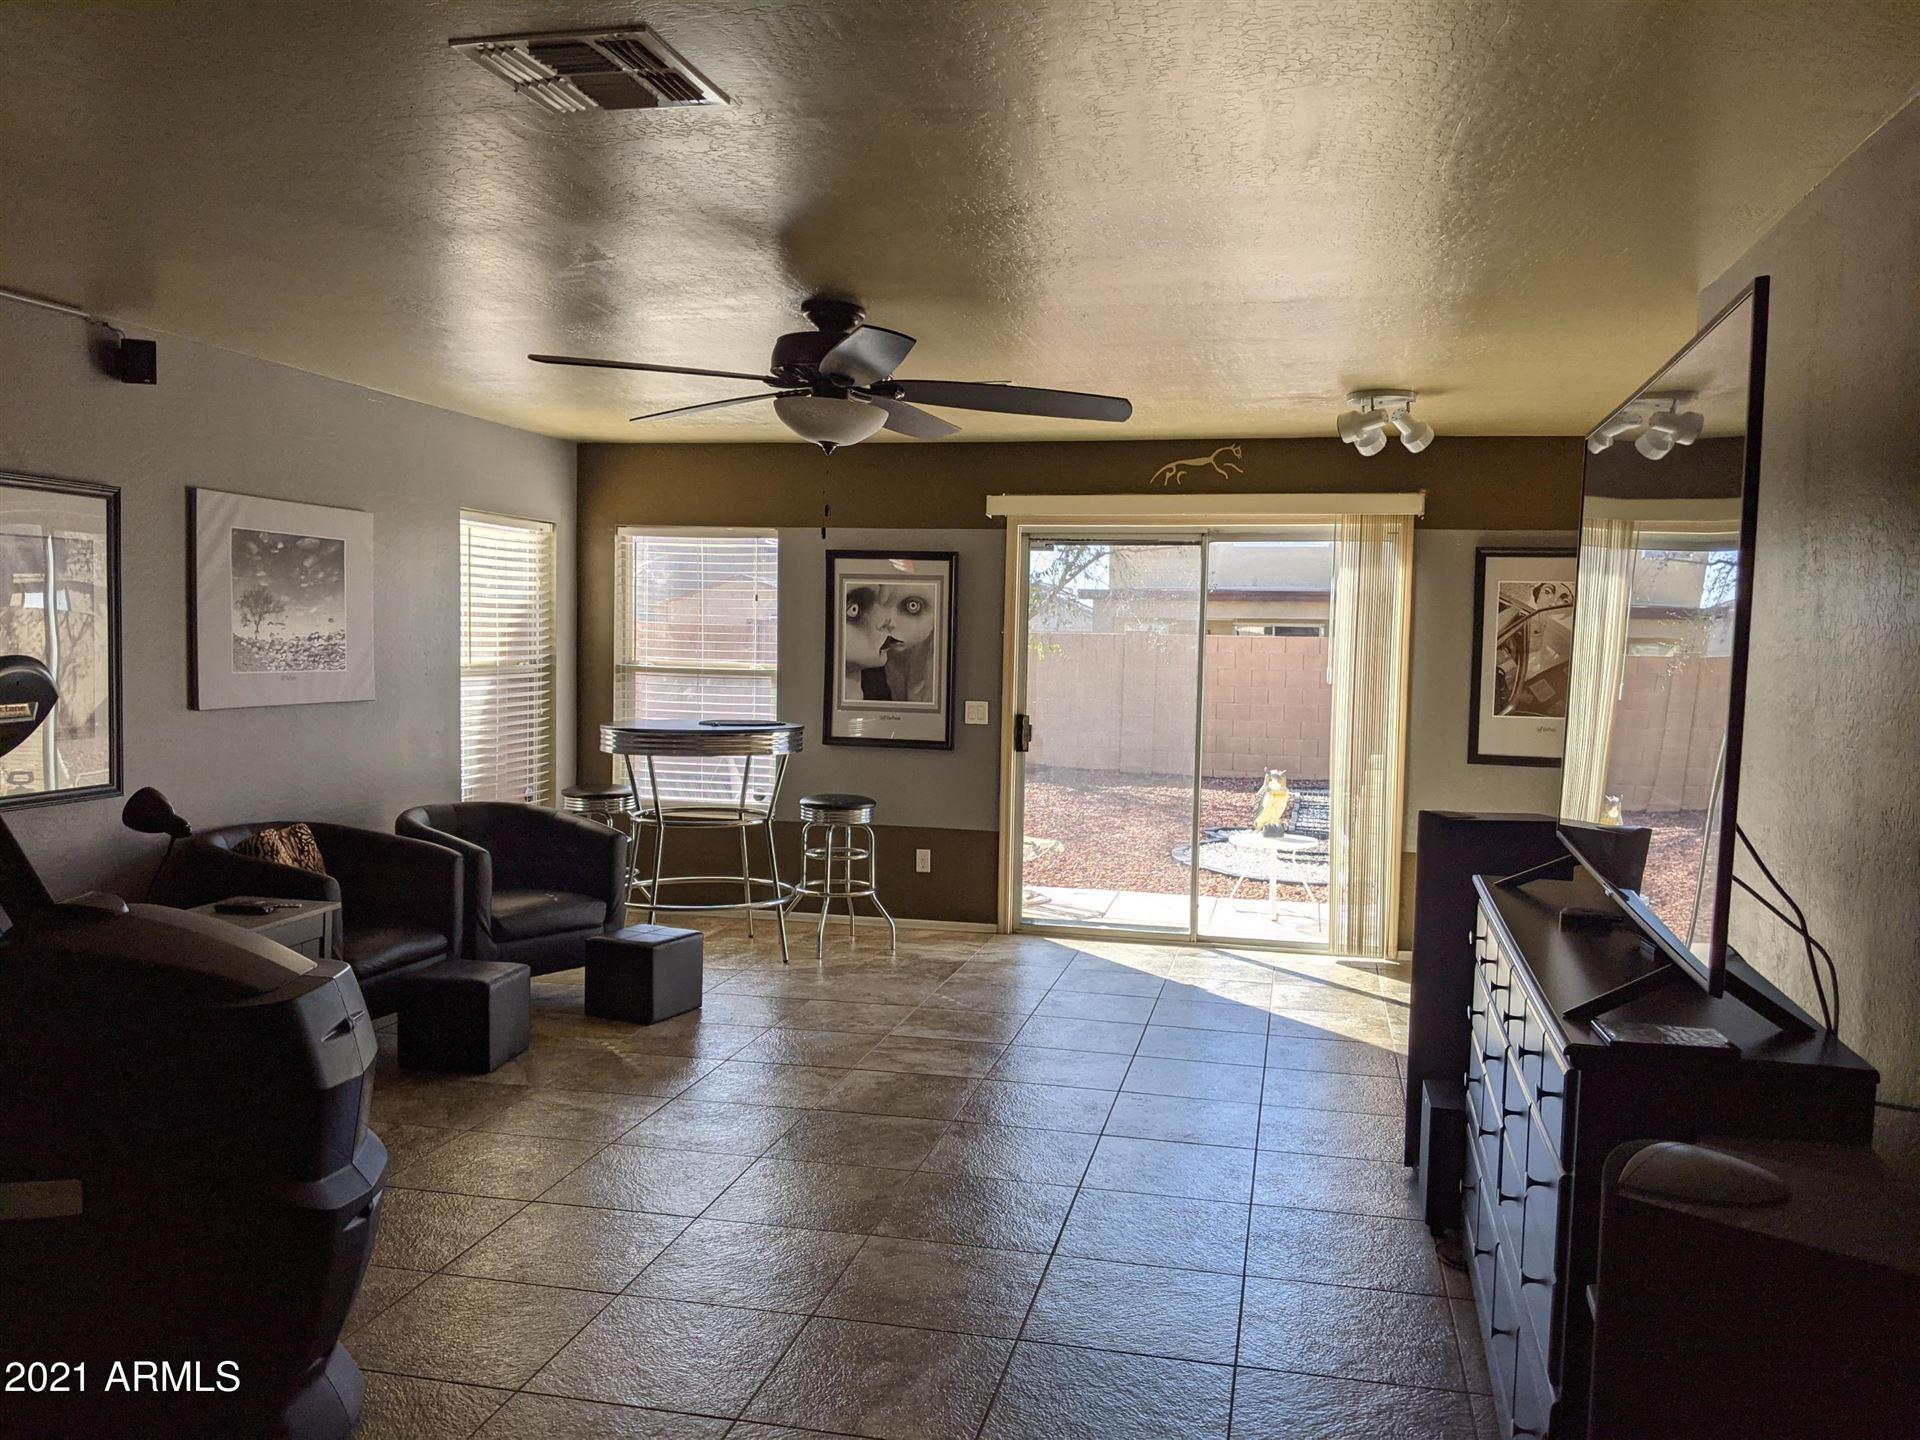 Photo of 11919 W SCOTTS Drive, El Mirage, AZ 85335 (MLS # 6200272)